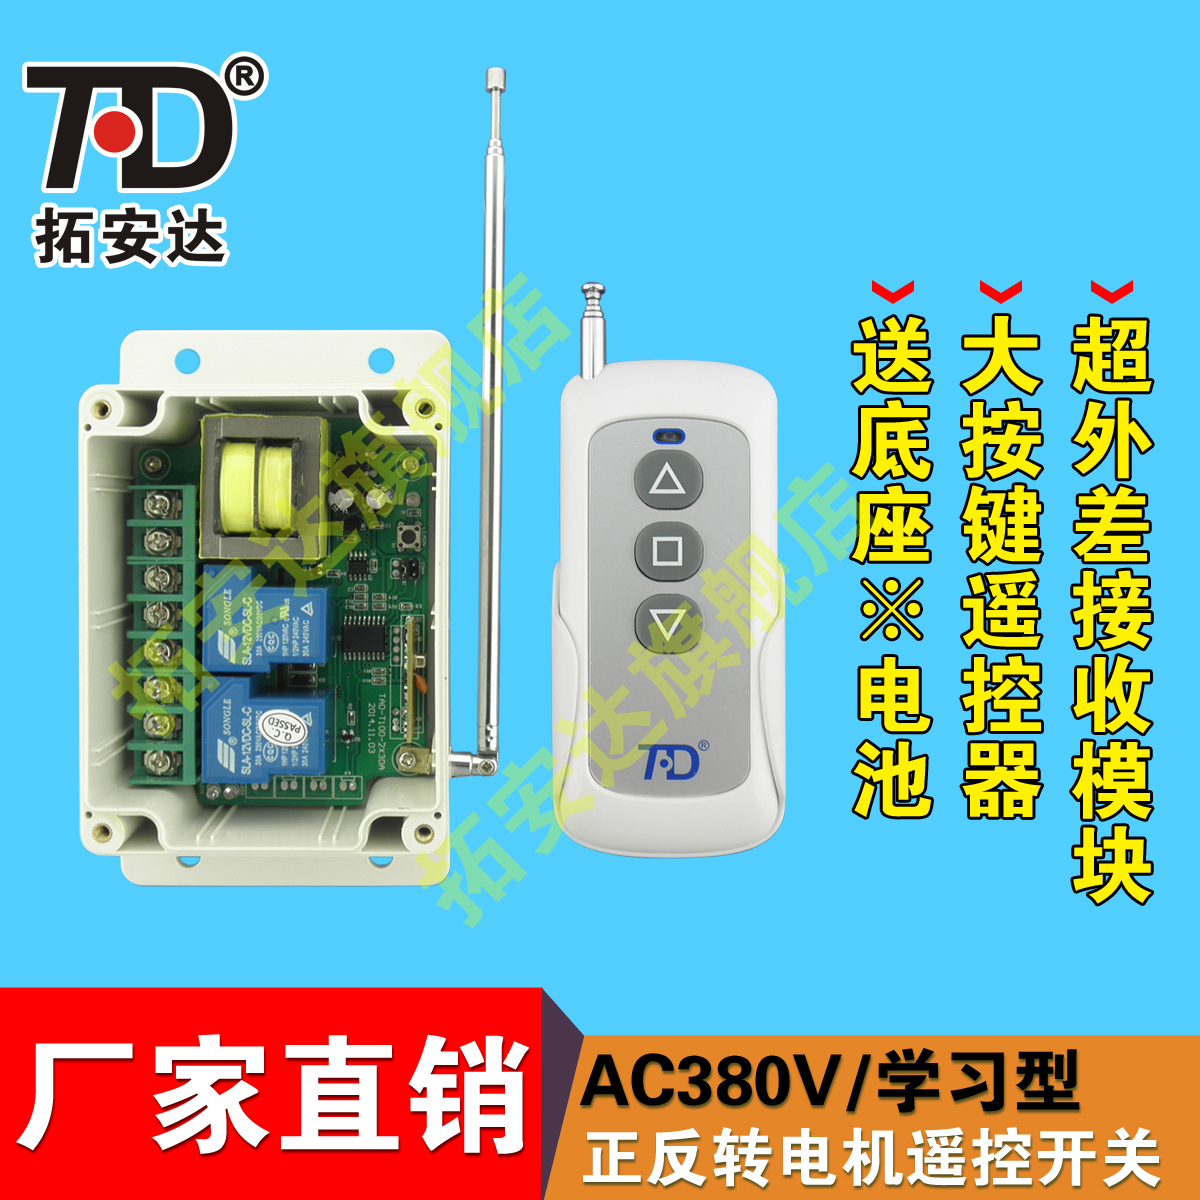 Interruptor de controle remoto SEM FIO positivo motor 380V / 2 / / portão portão com controle remoto e teclas grandes